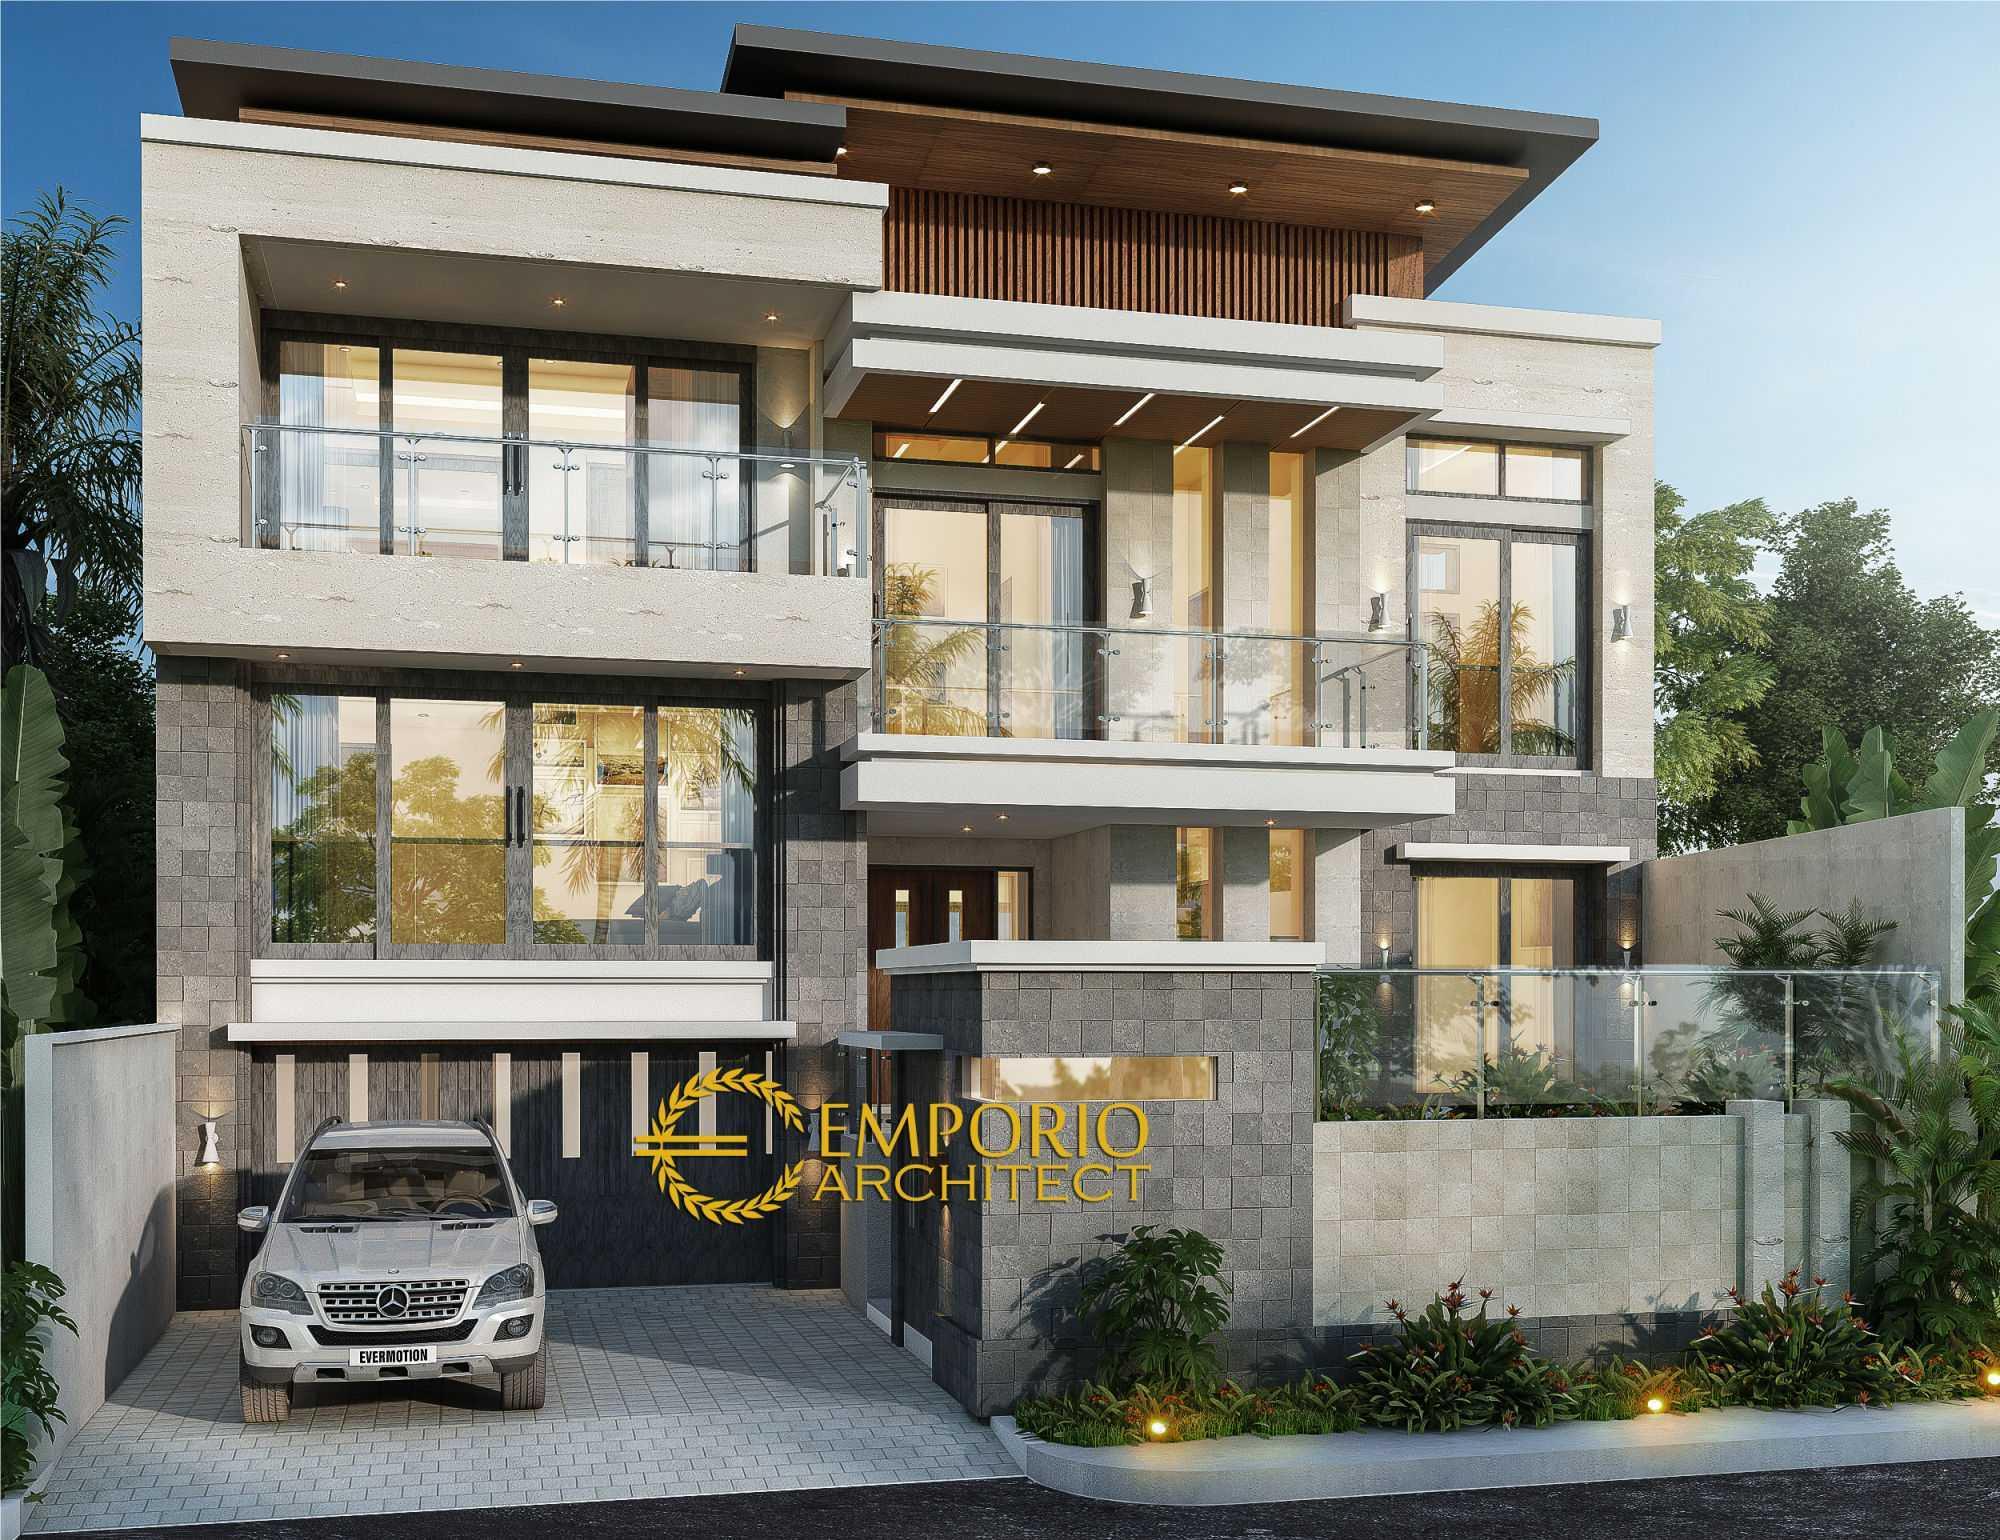 Jasa Arsitek Emporio Architect di Semarang